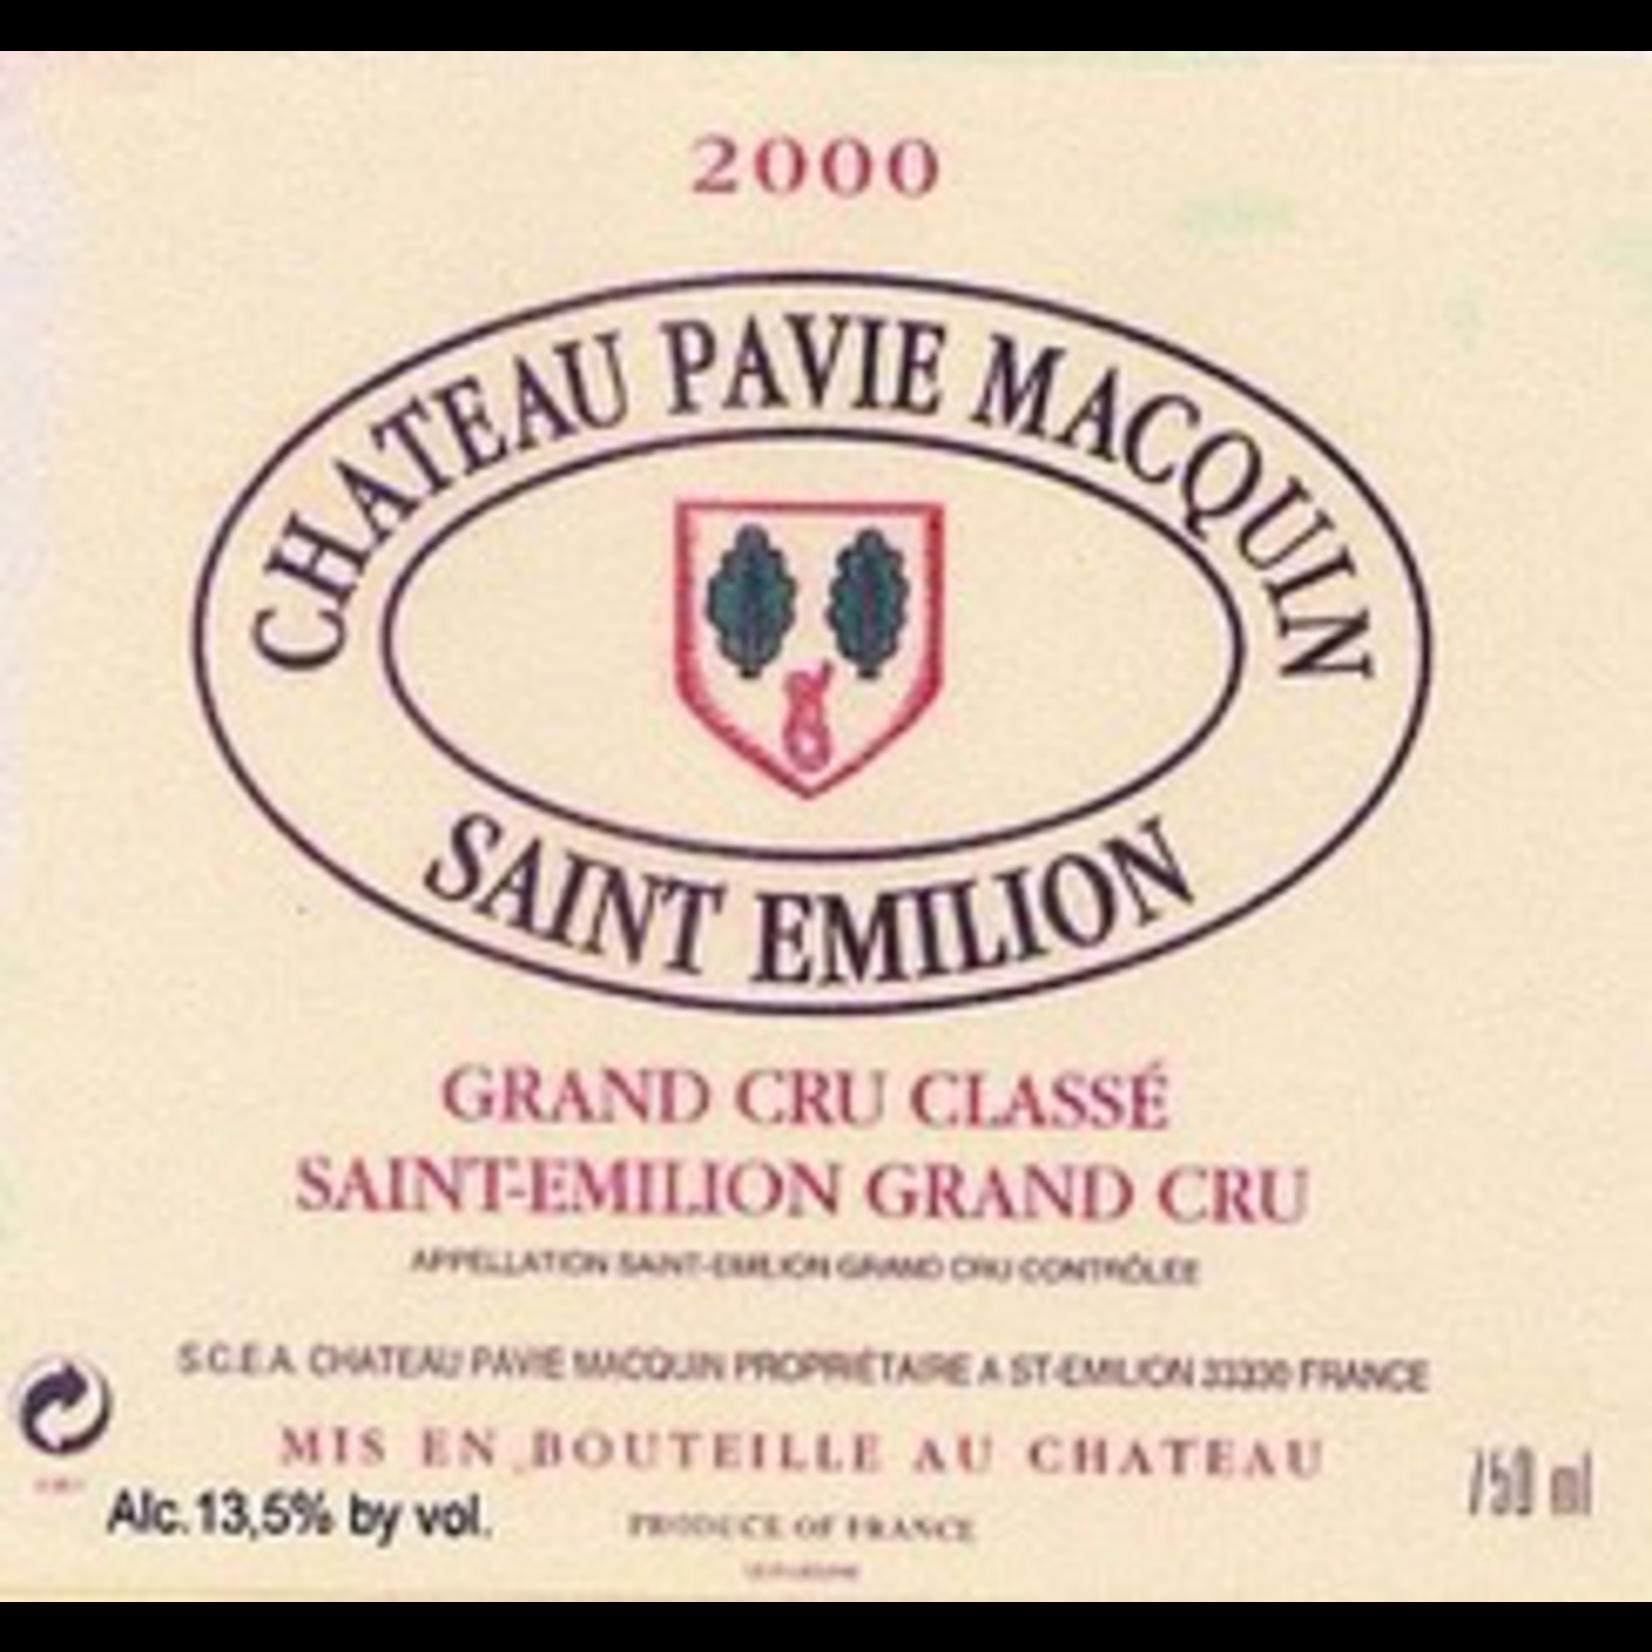 Wine Château Pavie-Macquin, Saint-Émilion Grand Cru Classé 2000